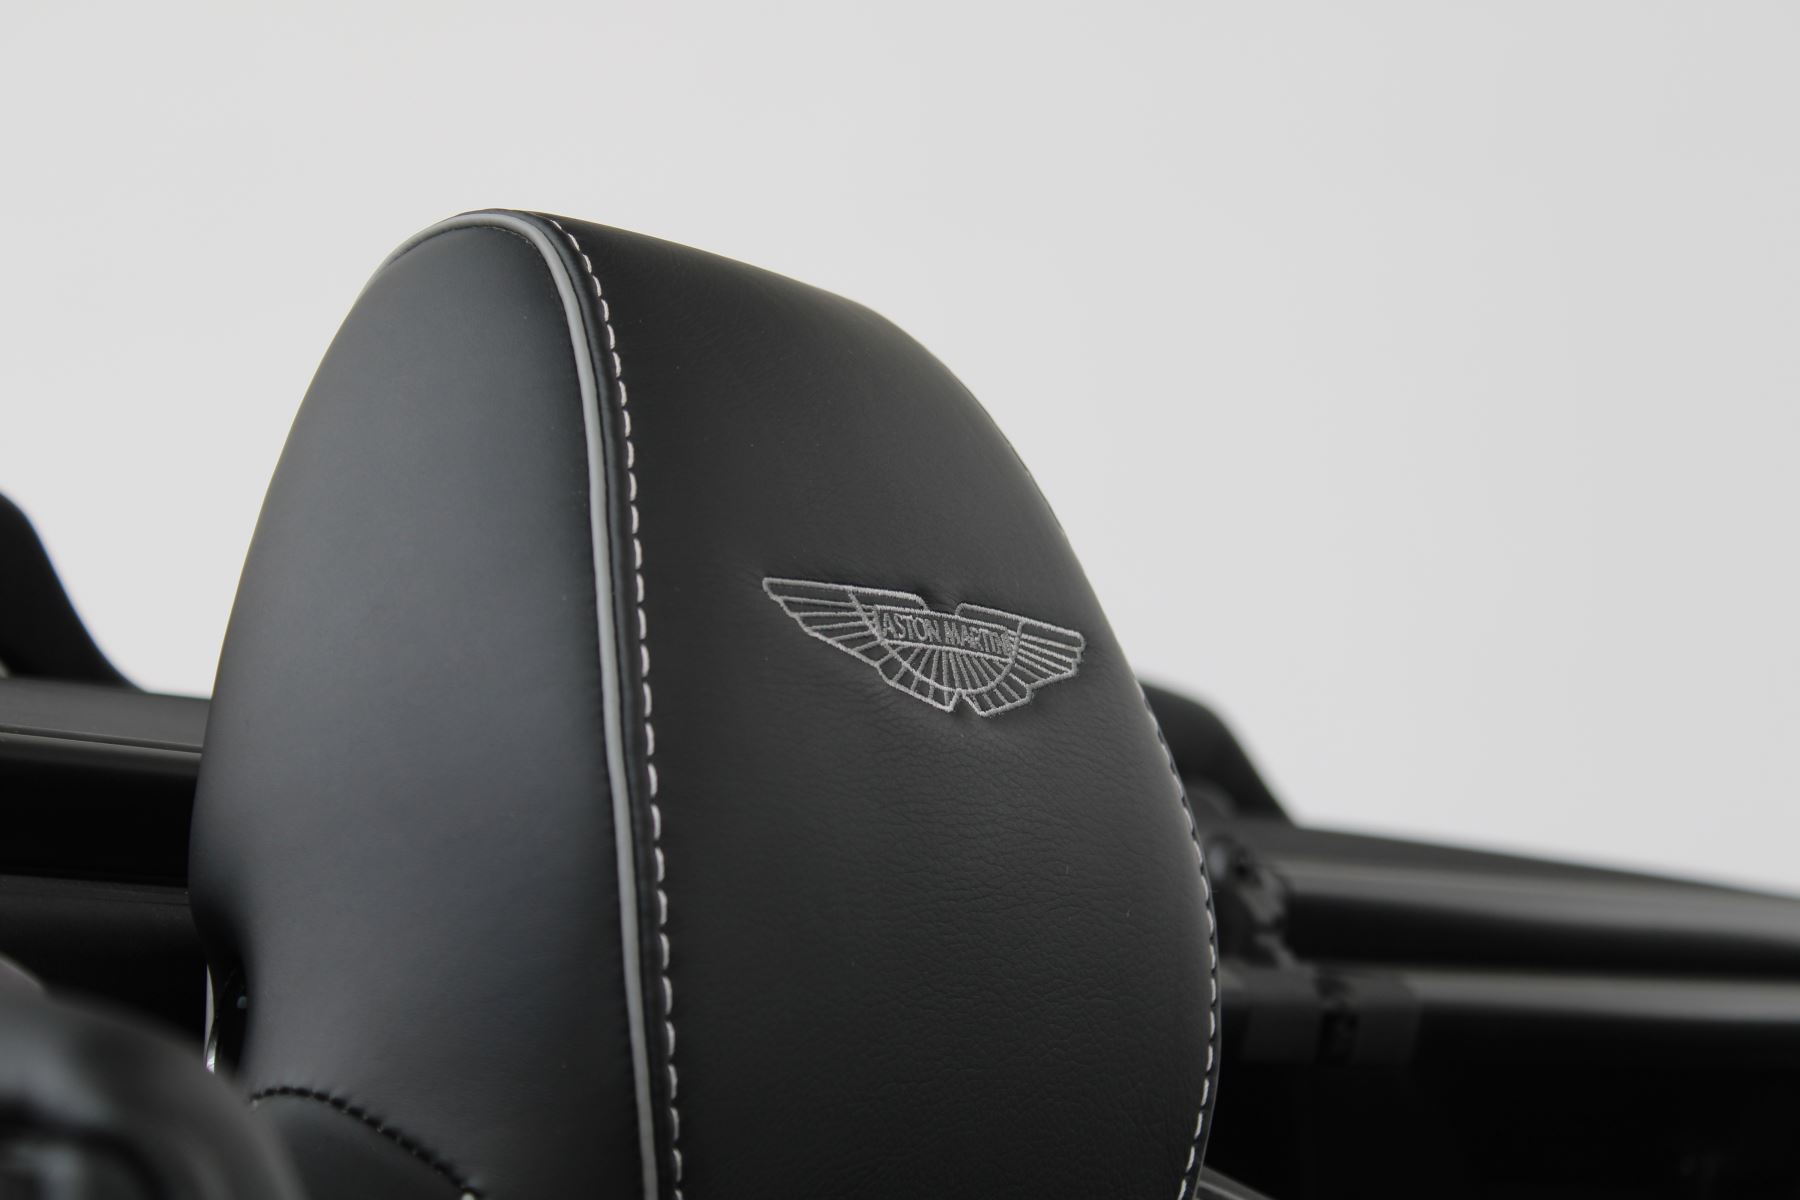 Aston Martin DB9 V12 GT 2dr Volante Skyfall Silver image 17